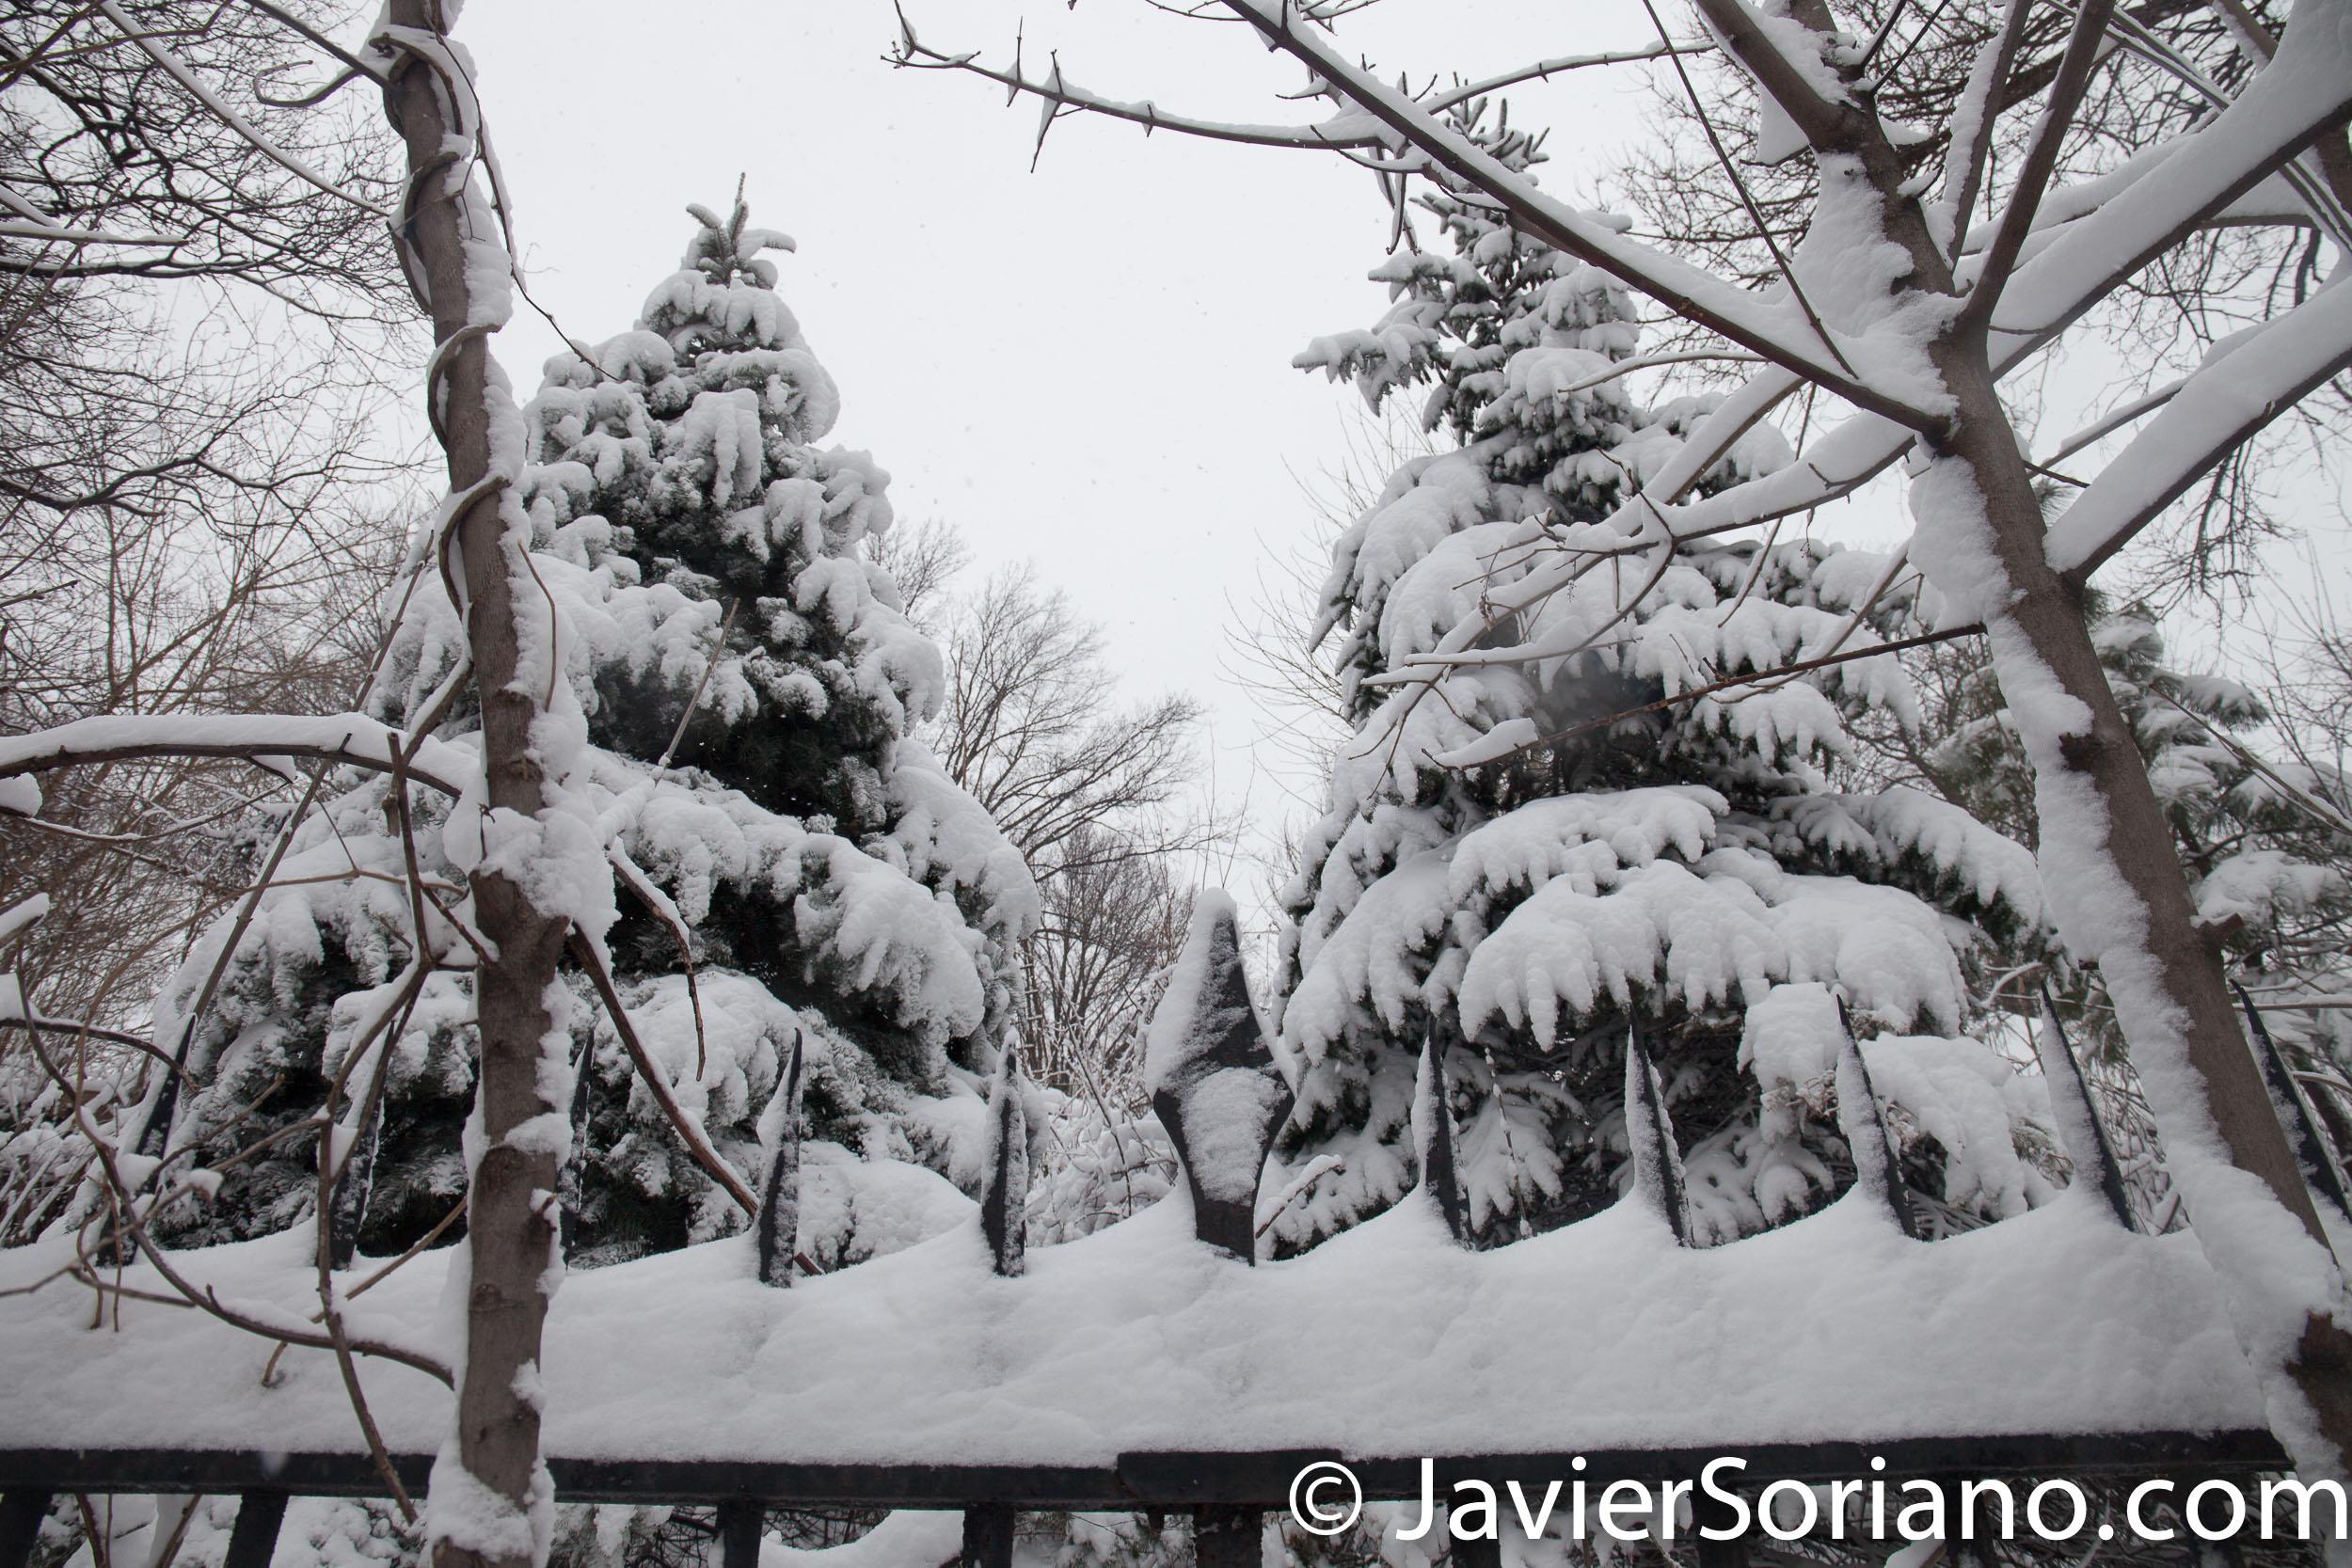 Afternoon. 2/9/2017 NYC - Winter storm Niko. Brooklyn Botanic Garden. Photo by Javier Soriano/www.JavierSoriano.com